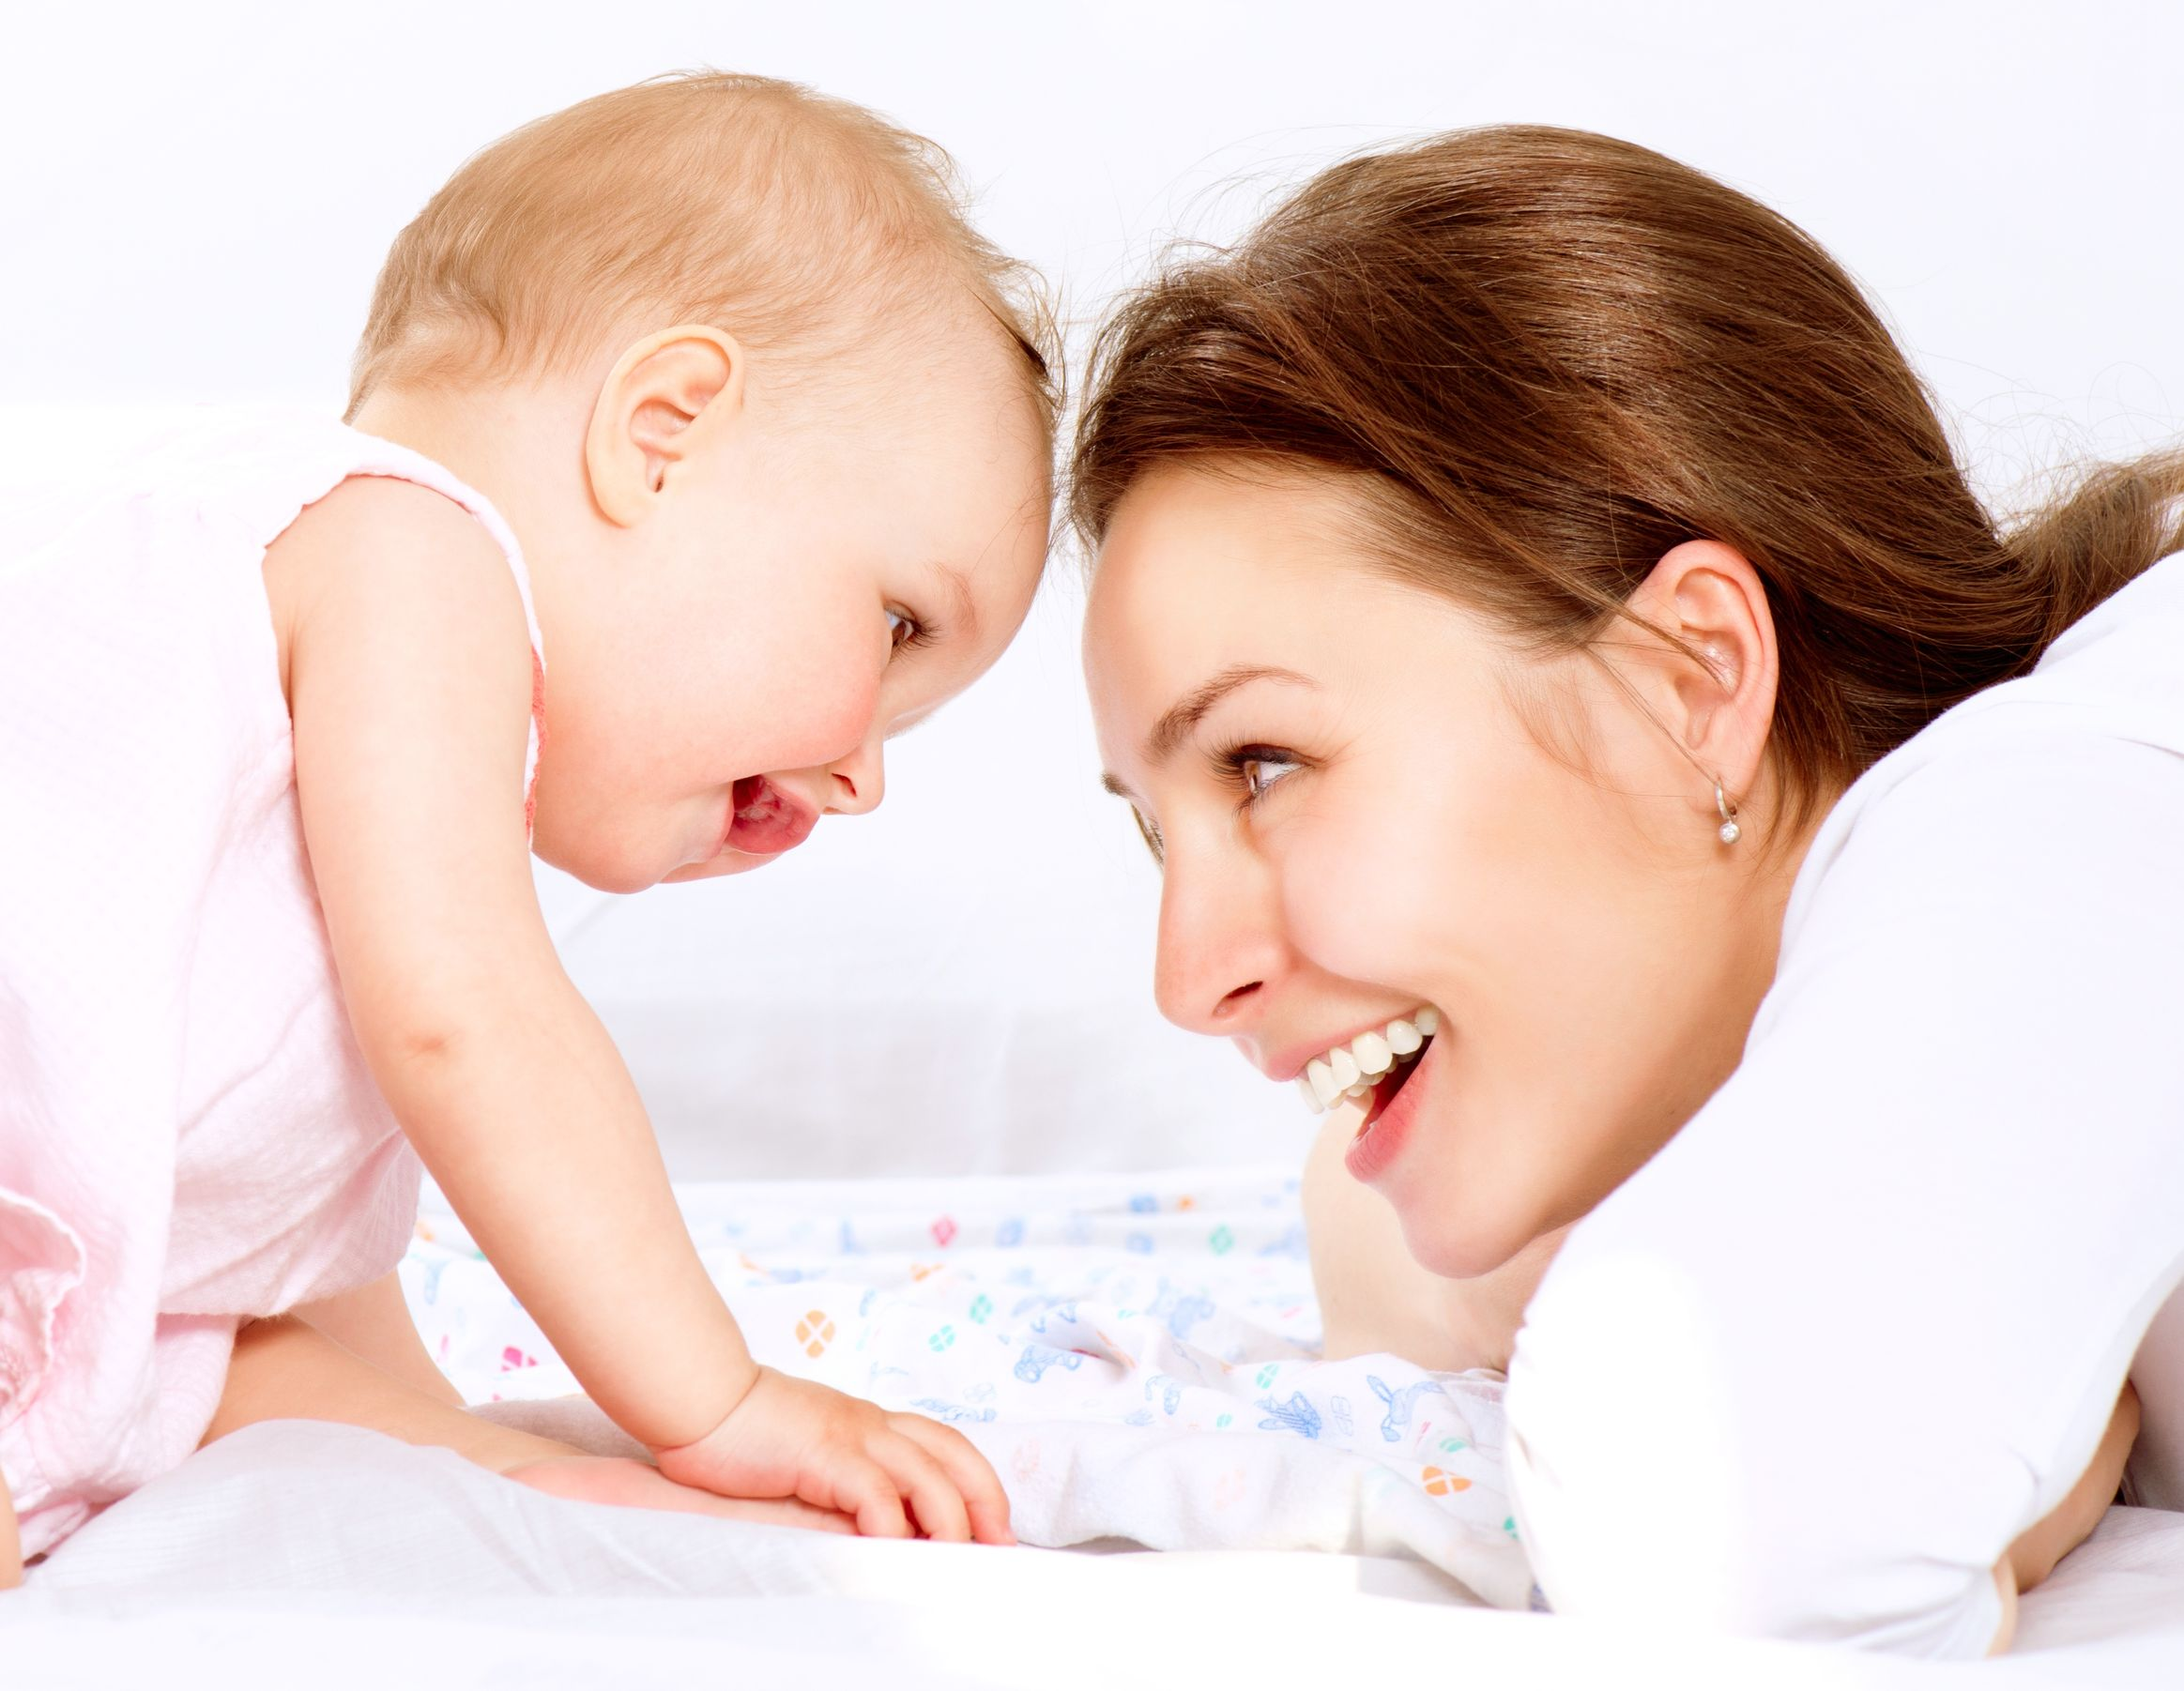 Dezvoltarea bebelusilor